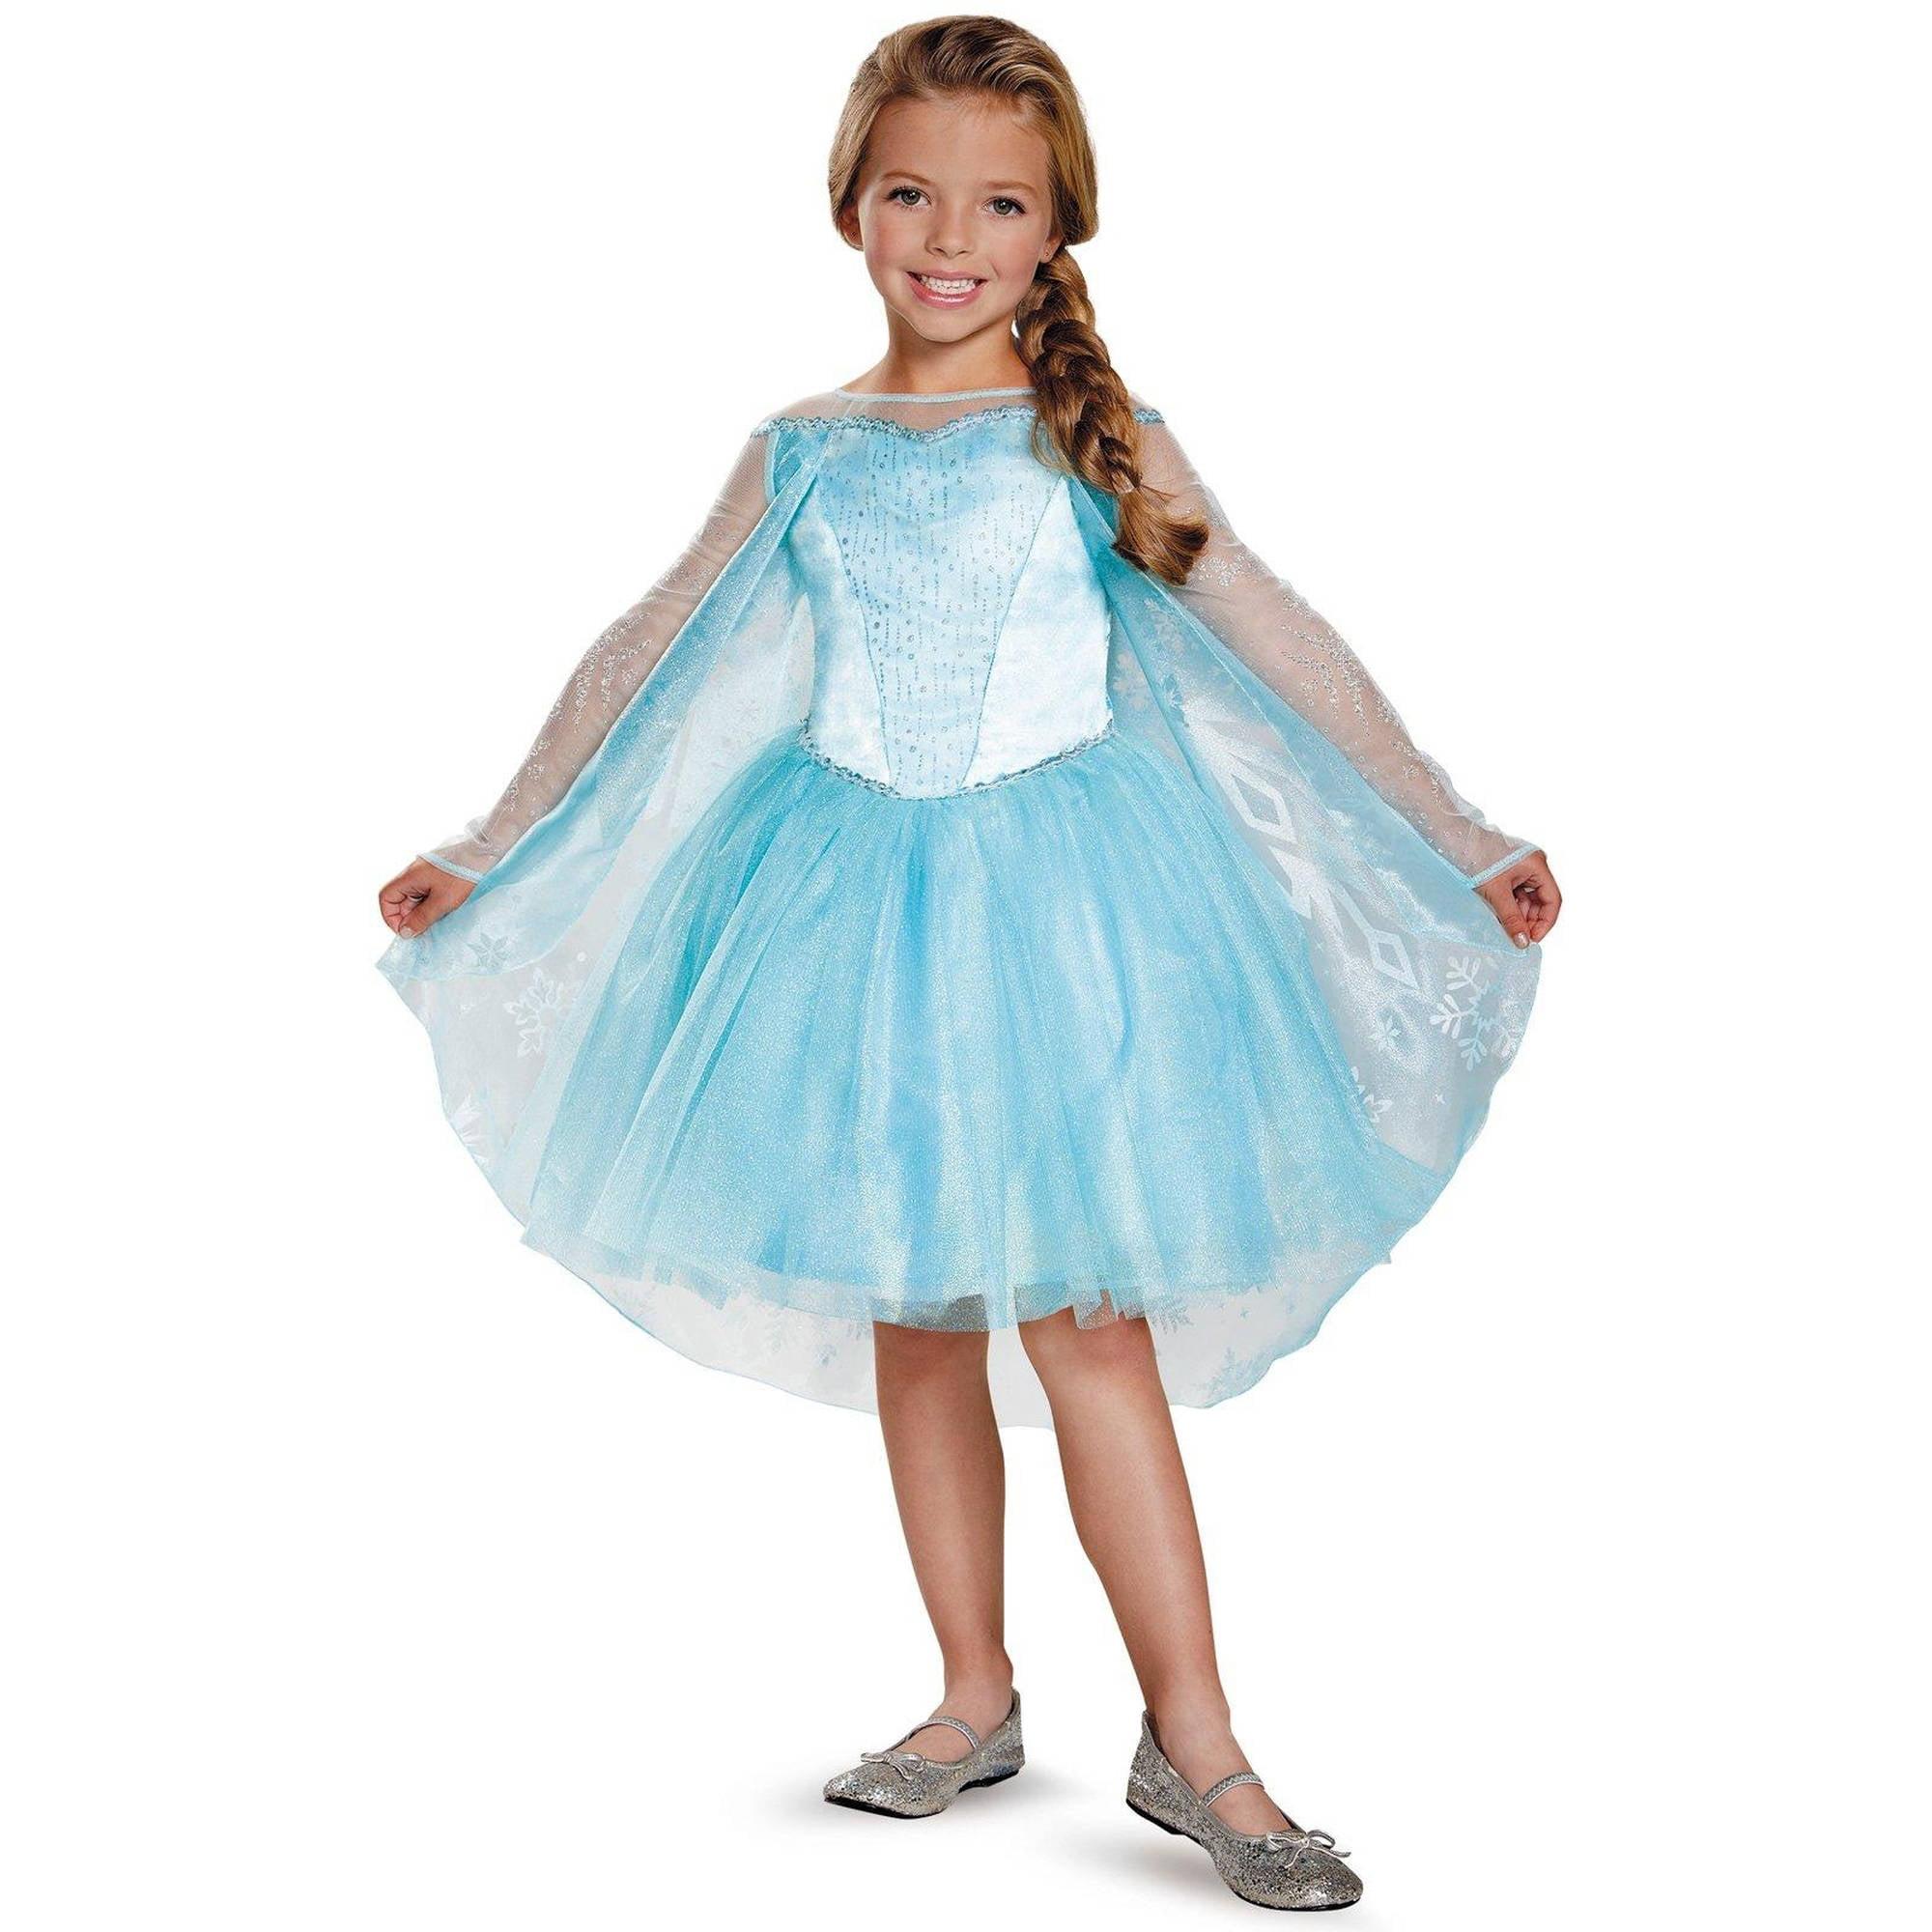 Frozen Toddler Prestige Elsa Tutu Toddler Halloween Costume, 3T-4T